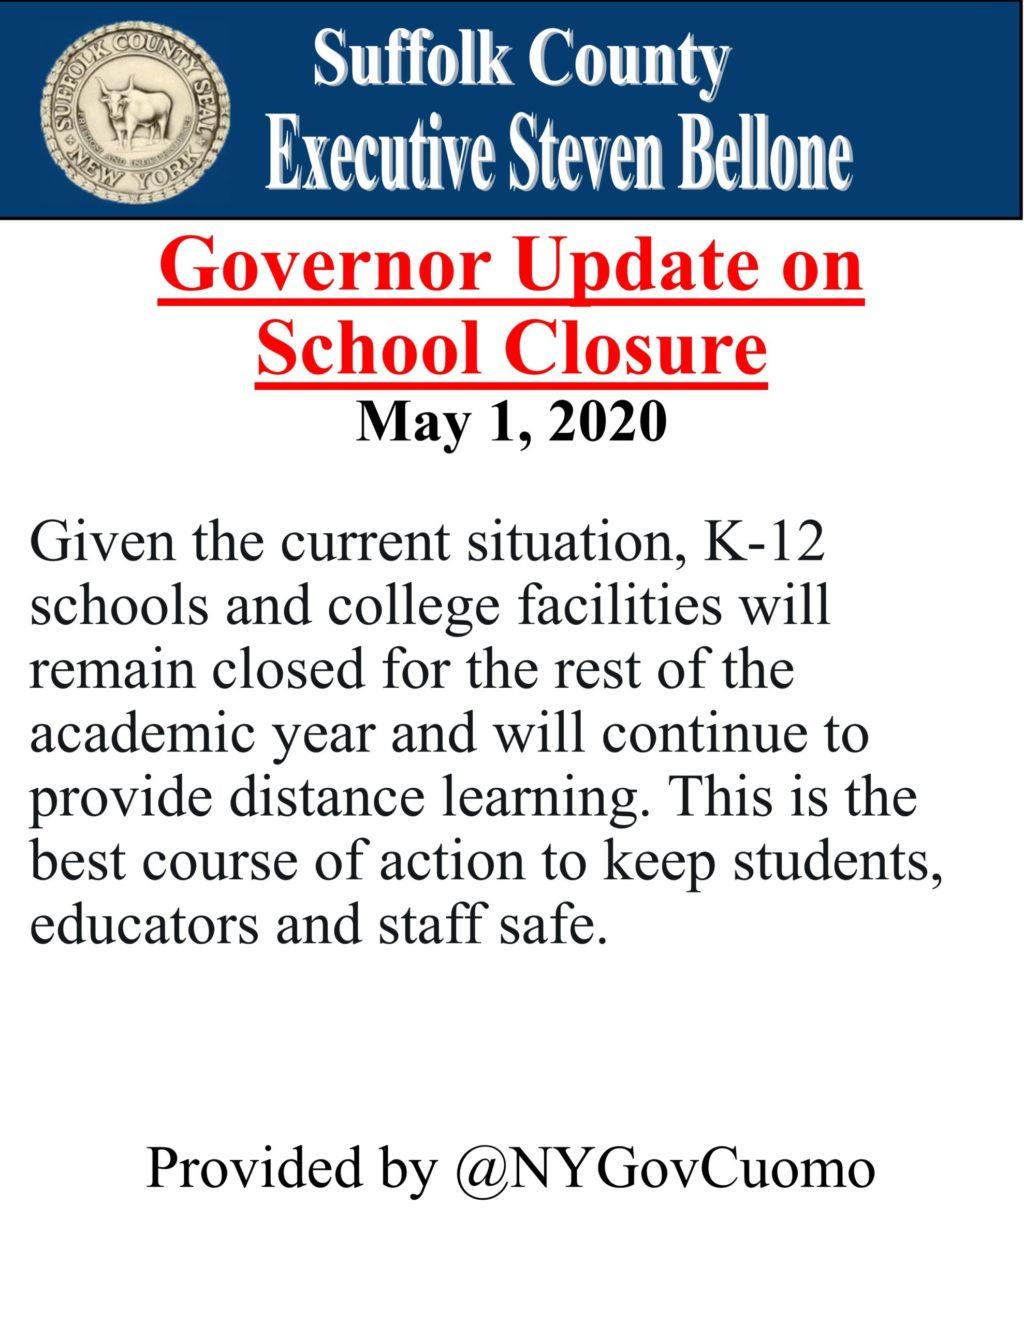 English -NY Gov Cuomo School Closure Update Edit 5.1.2020